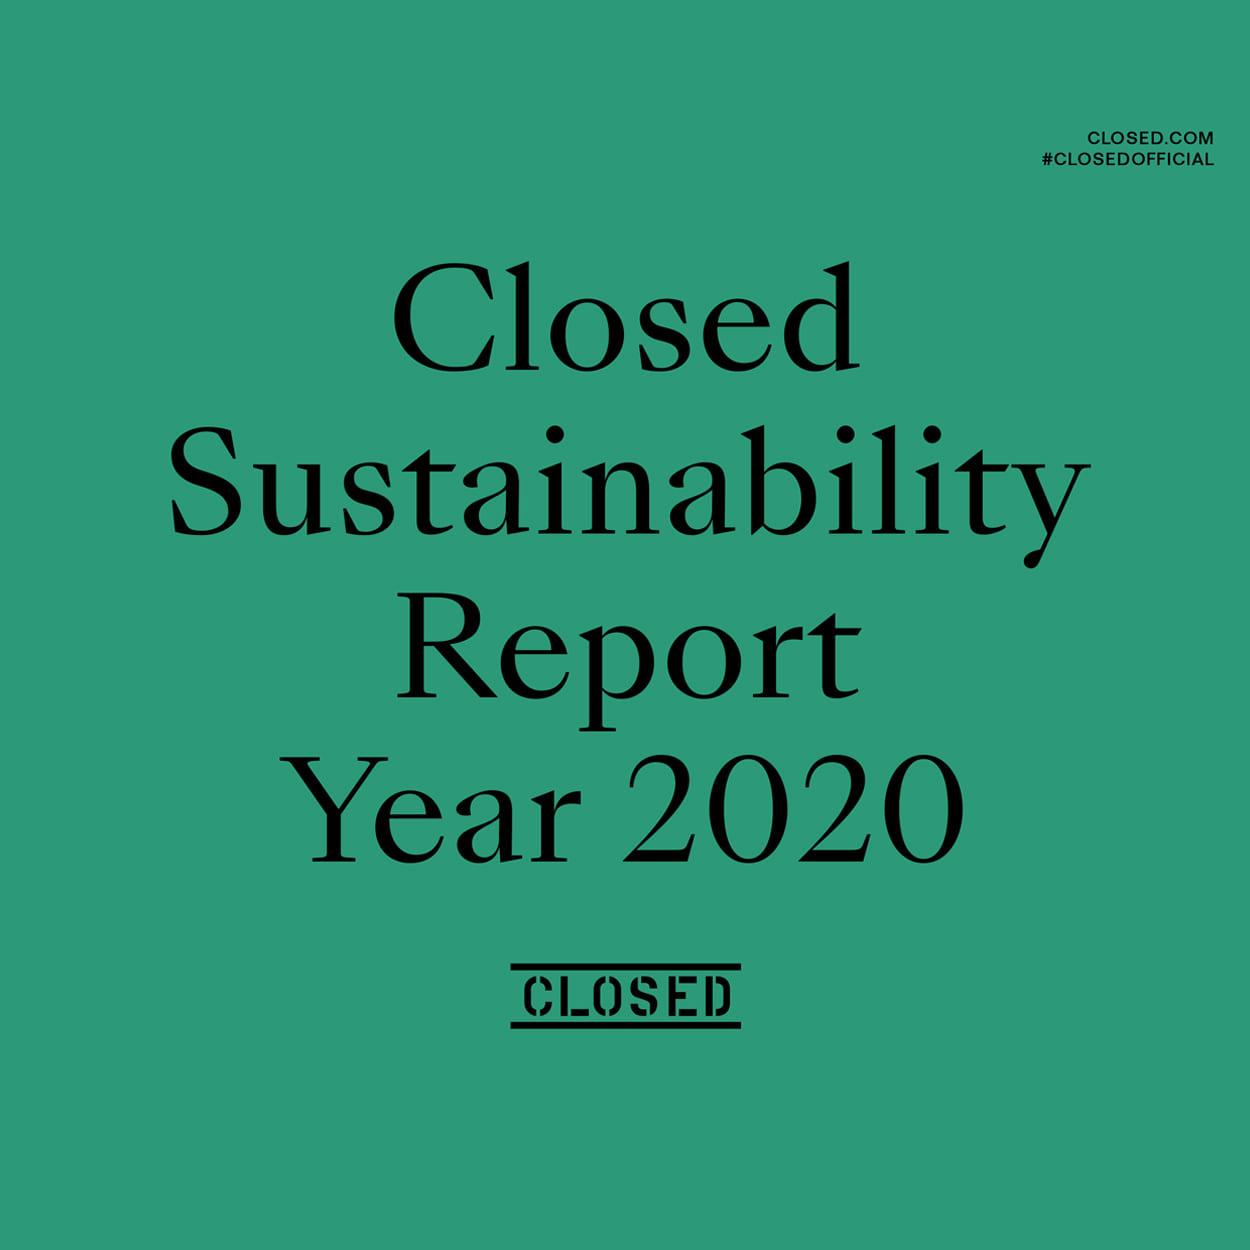 Closed Sustainability Report